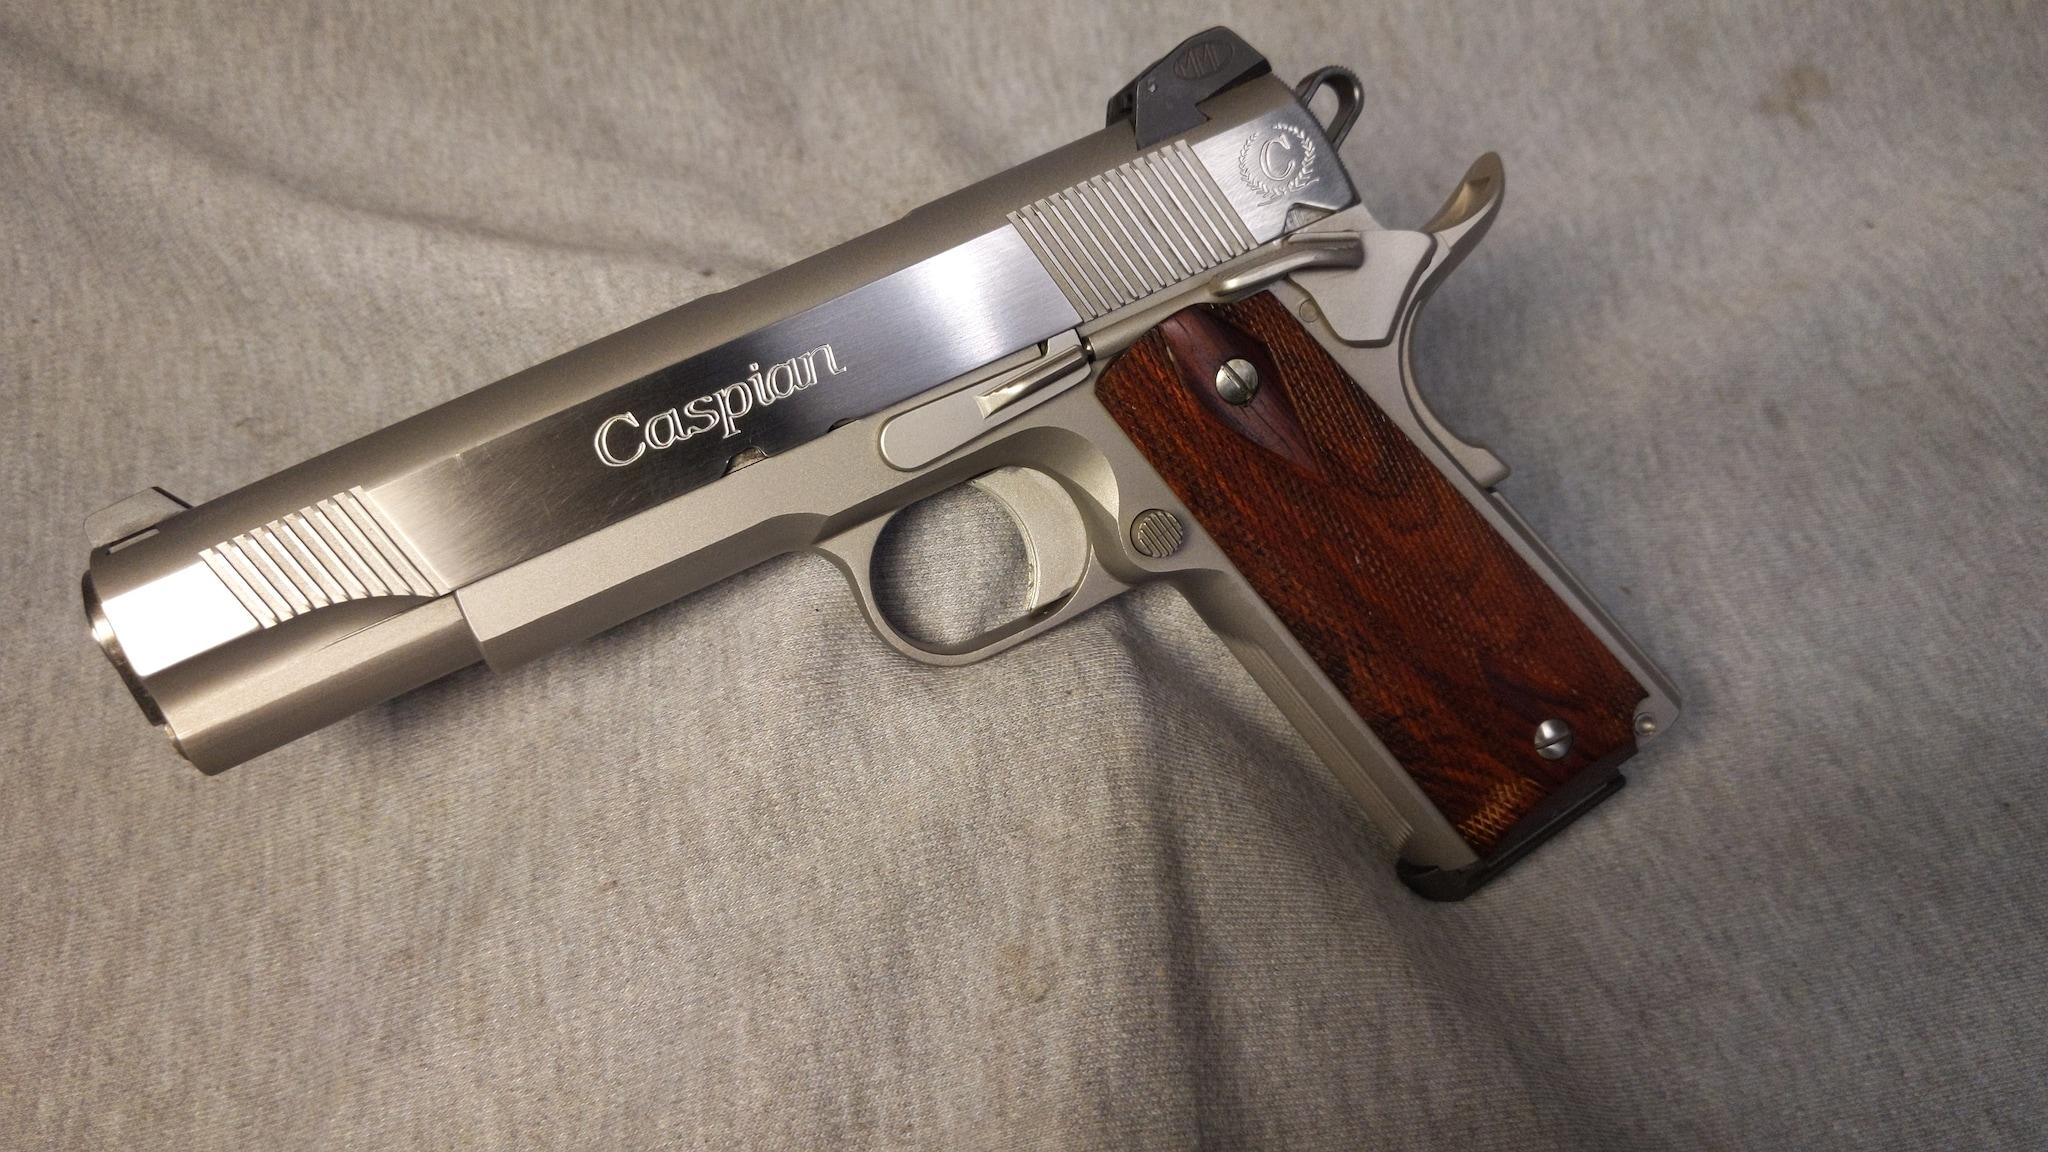 CASPIAN ARMS 1911